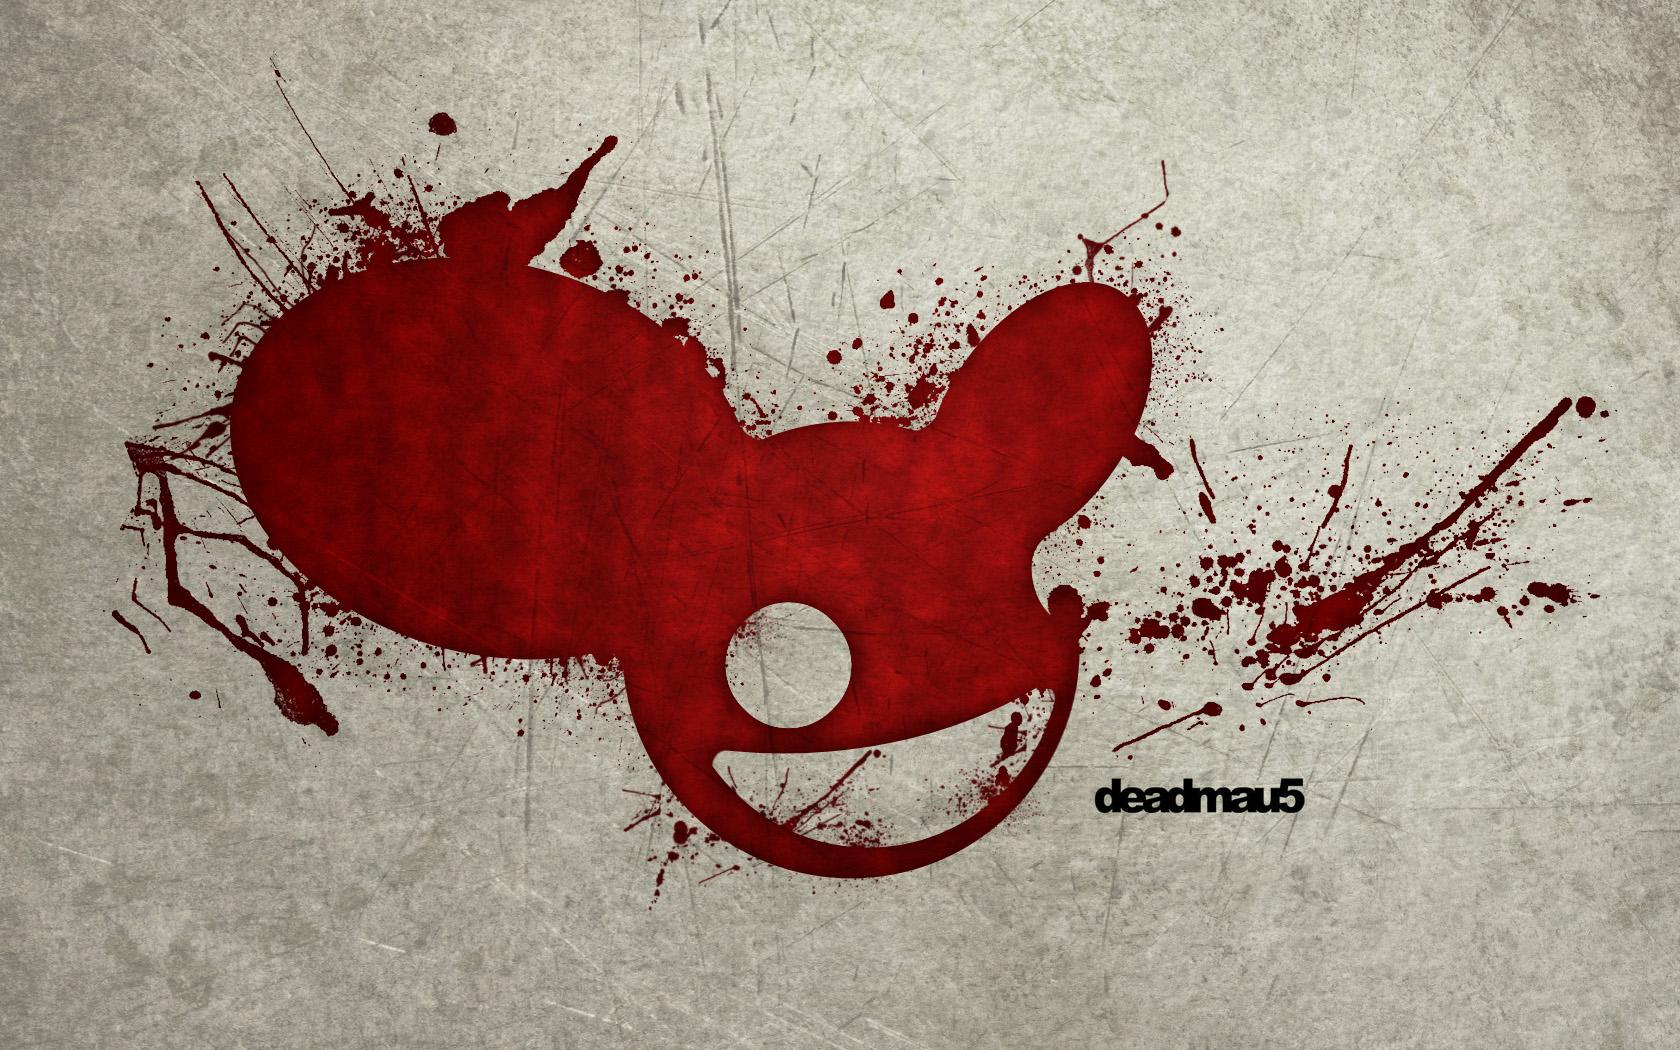 63 Deadmau5 HD Wallpapers Backgrounds 1680x1050